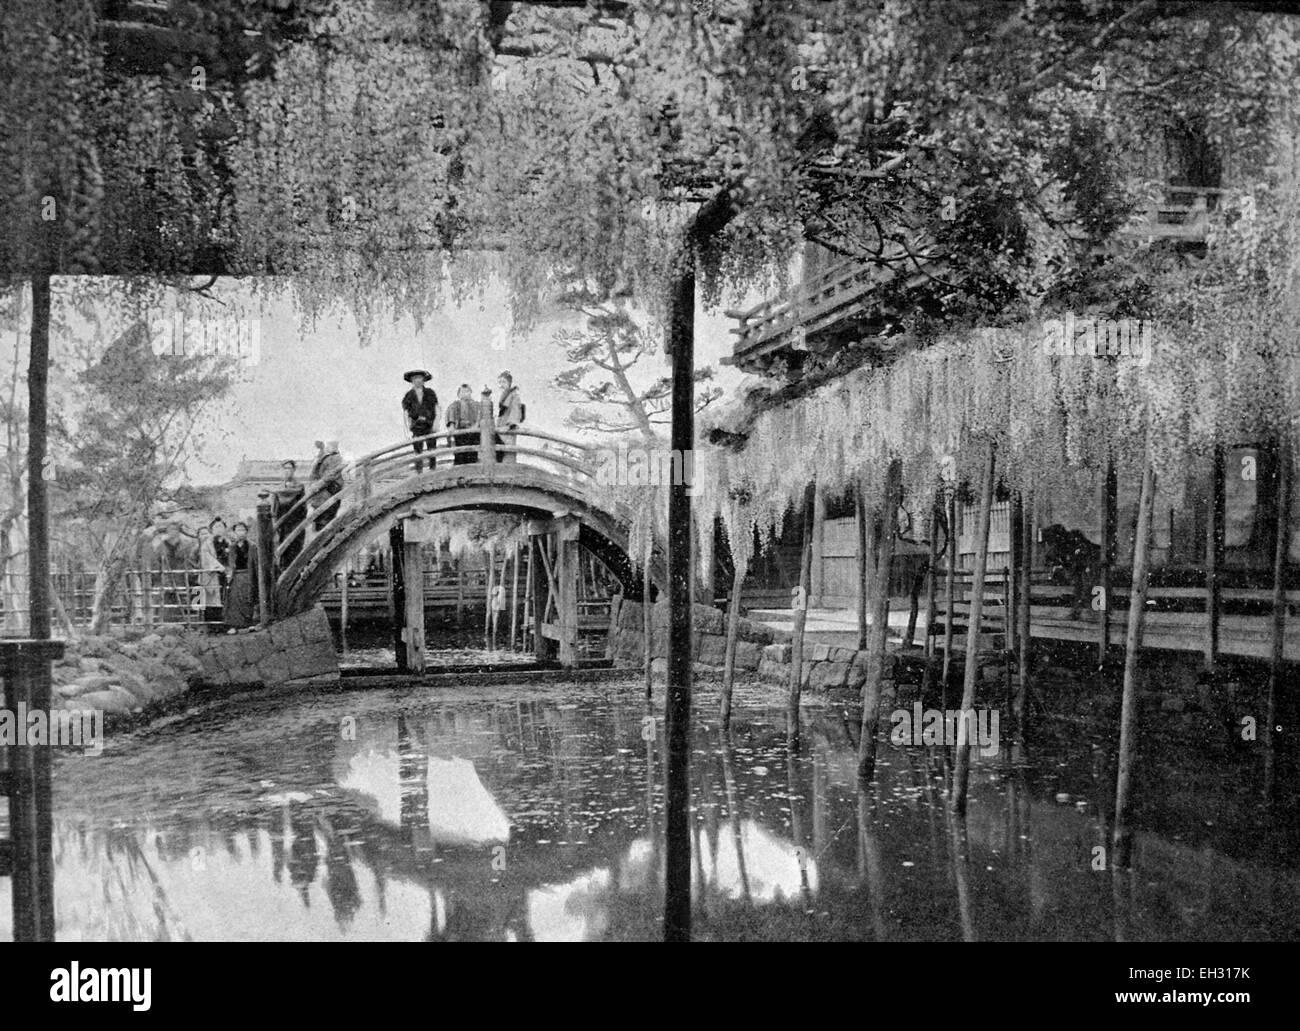 One of the first autotype photographs of L Etang de Shinji-un-ika, Tokyo, Japan - Stock Image